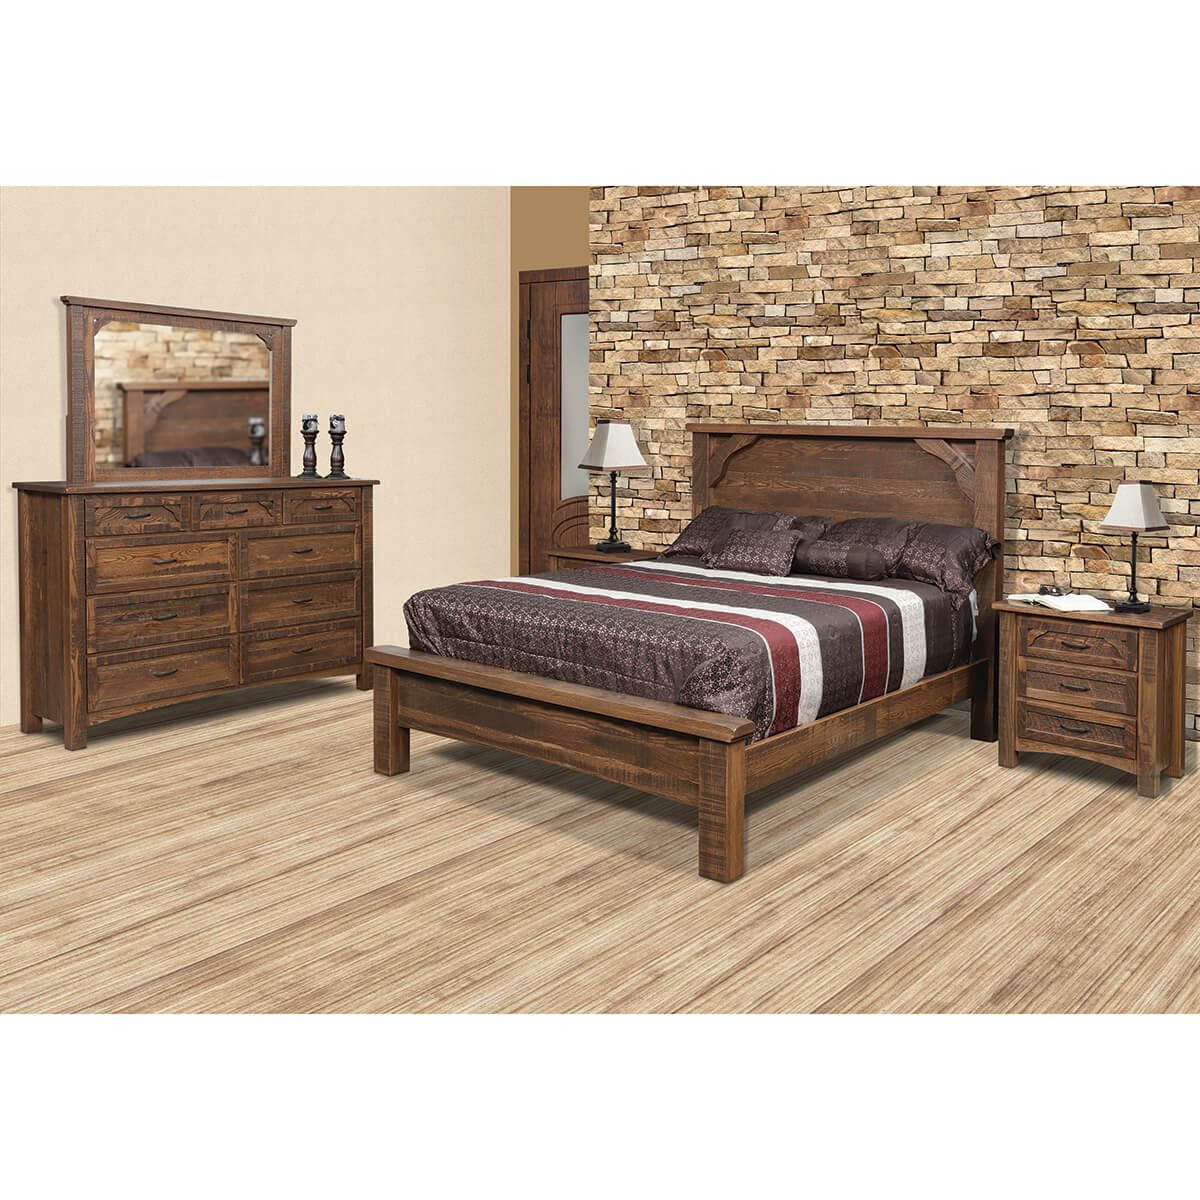 Conestoga Bedroom Collection Bedroom Collection Bedroom Furniture